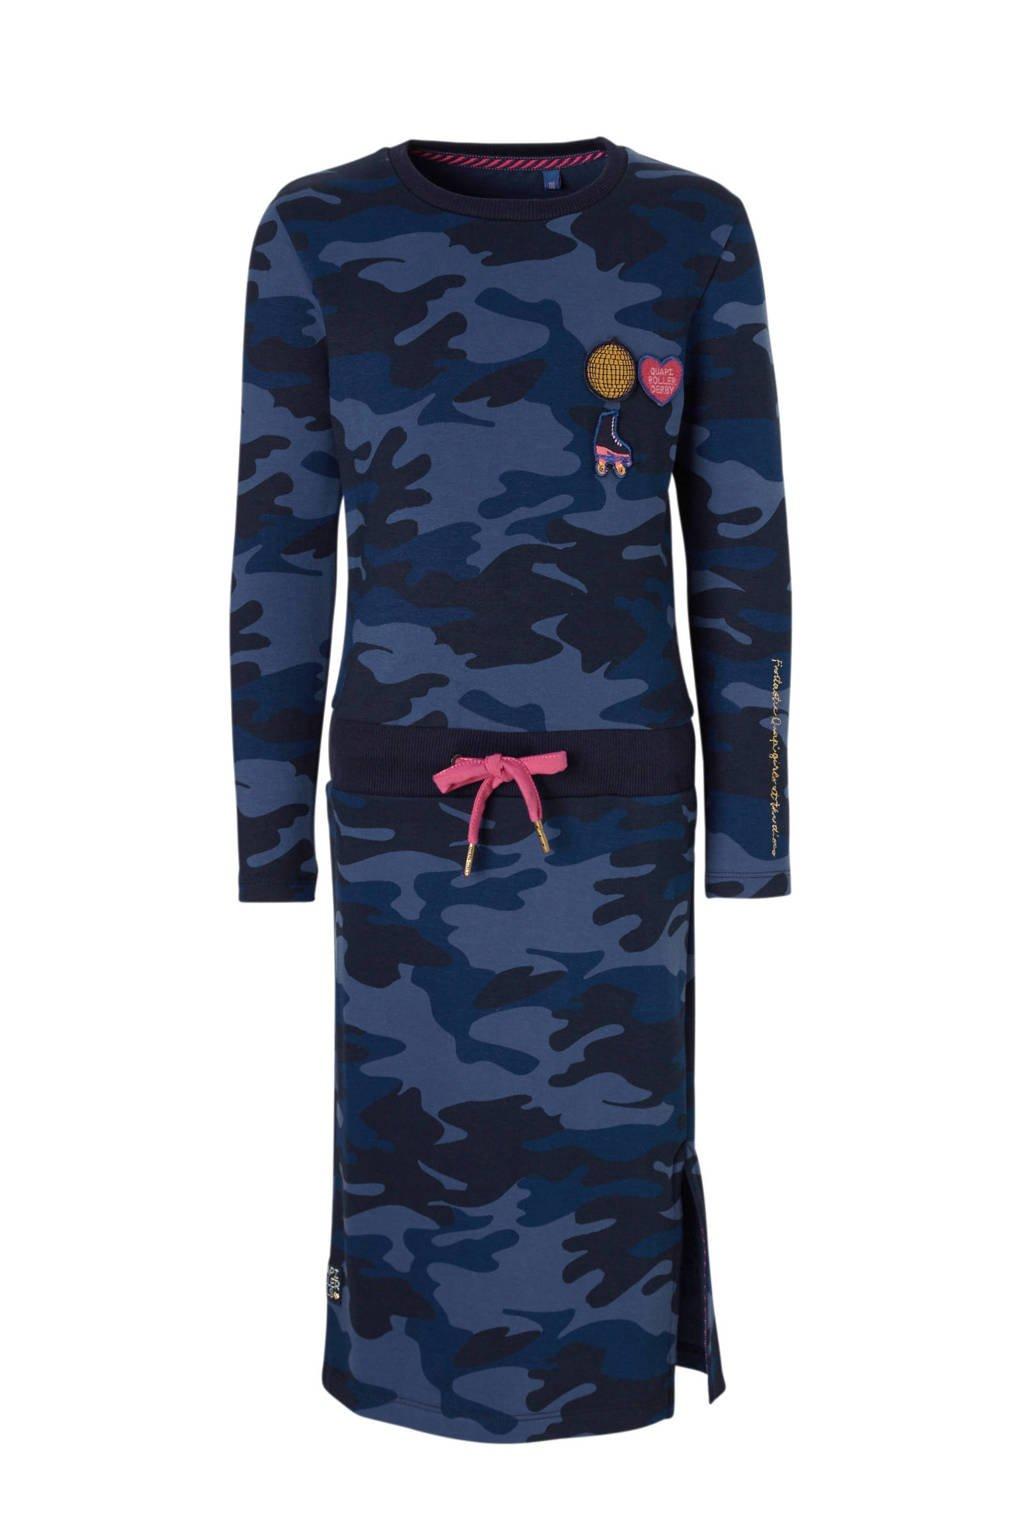 Quapi jurk Lizet met camouflageprint blauw, Blauw/zwart